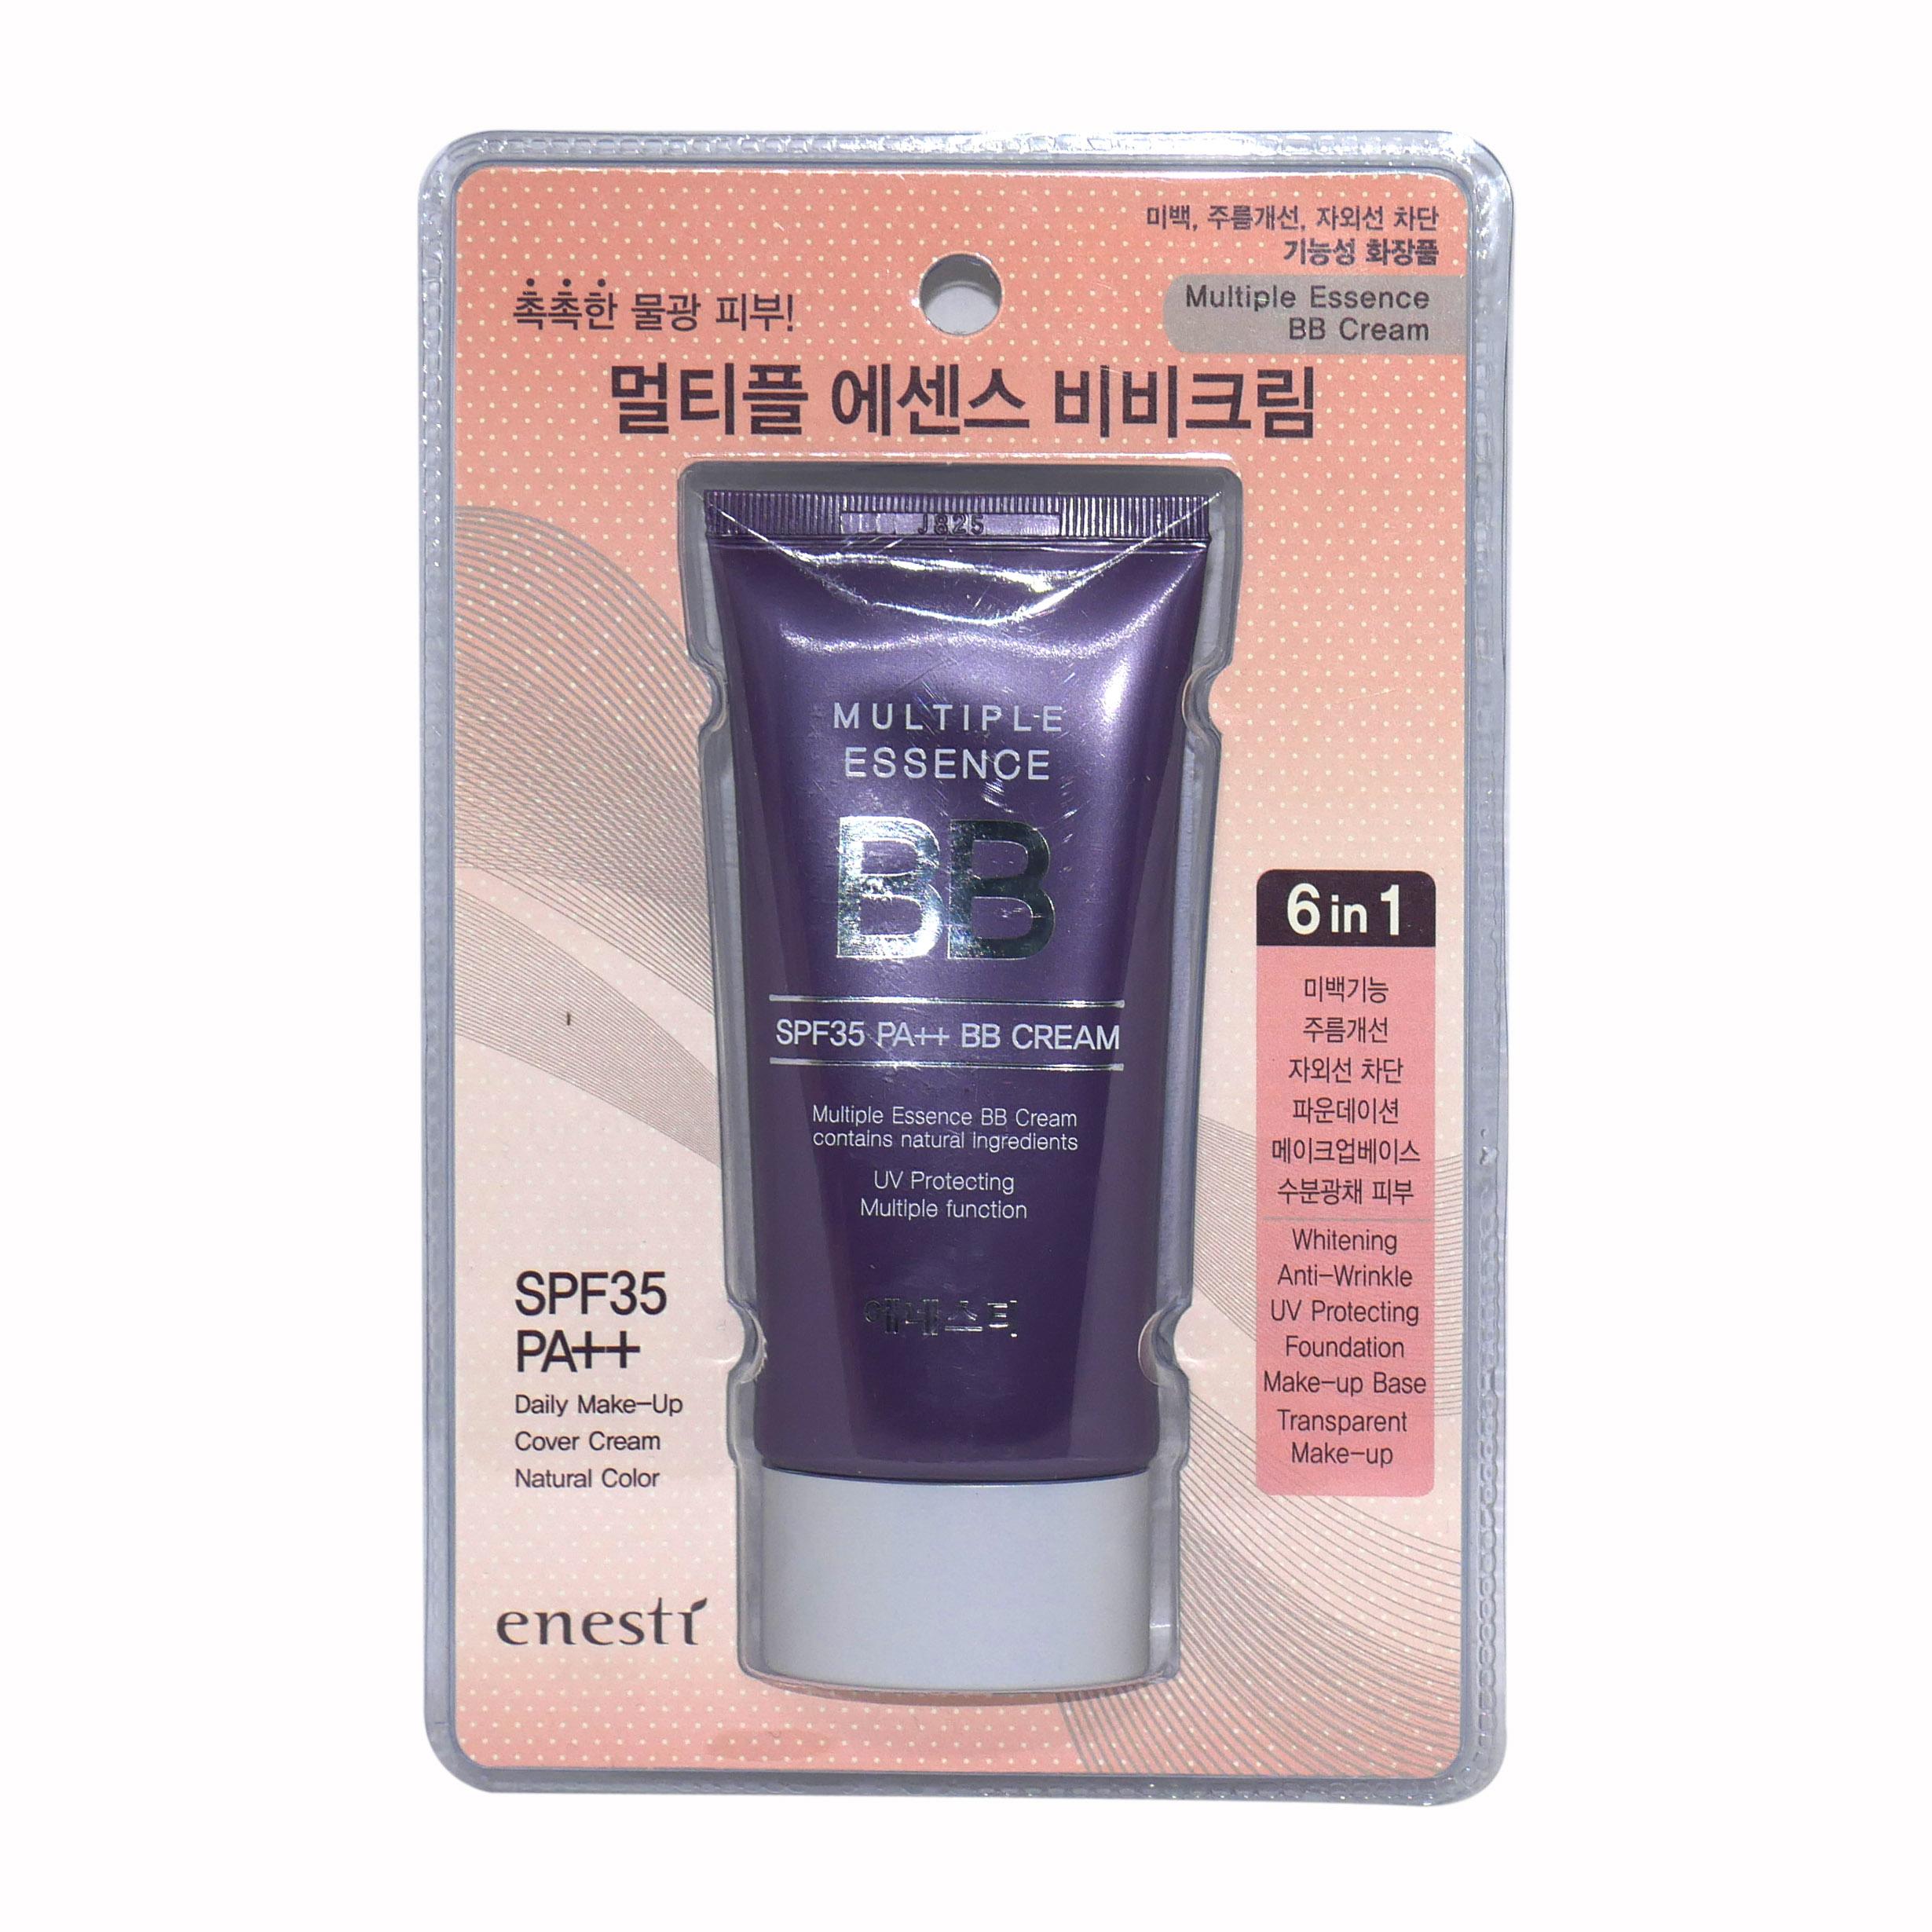 Enesti Multiple Essence BB Spf 35 PA+++ BB cream งานแท้เกาหลี ราคาส่งถูกๆ W.105 รหัส F2